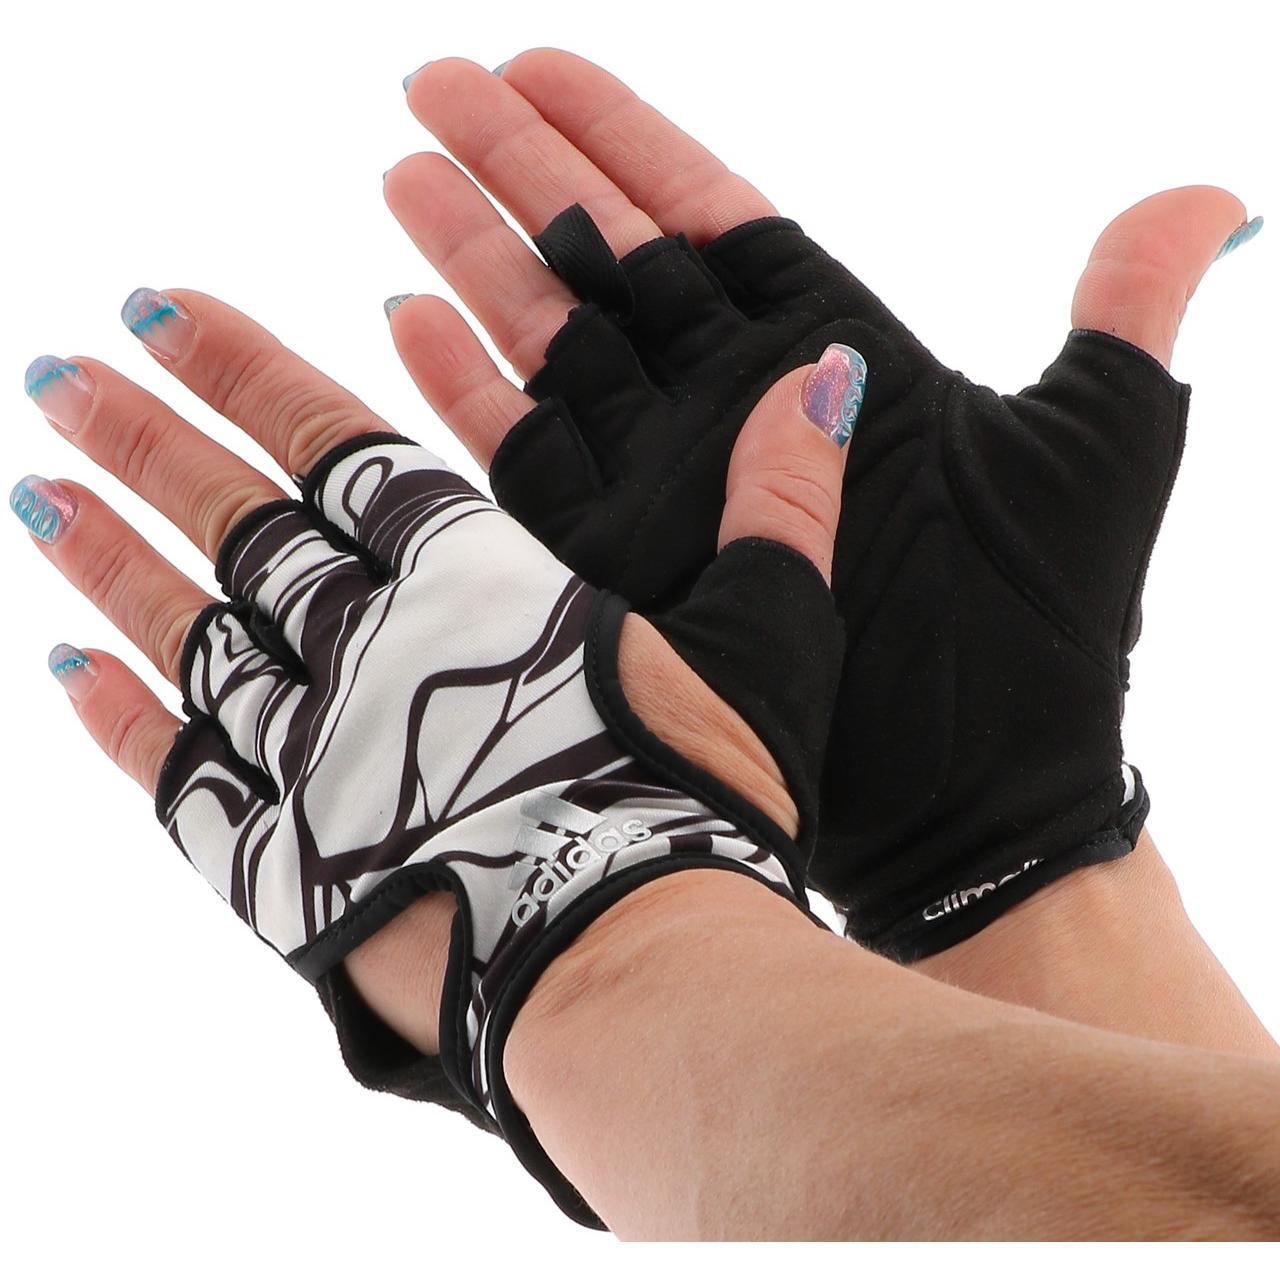 Mitaine-Adidas-Clite-training-femme-Blanc-49309-Neuf miniature 4